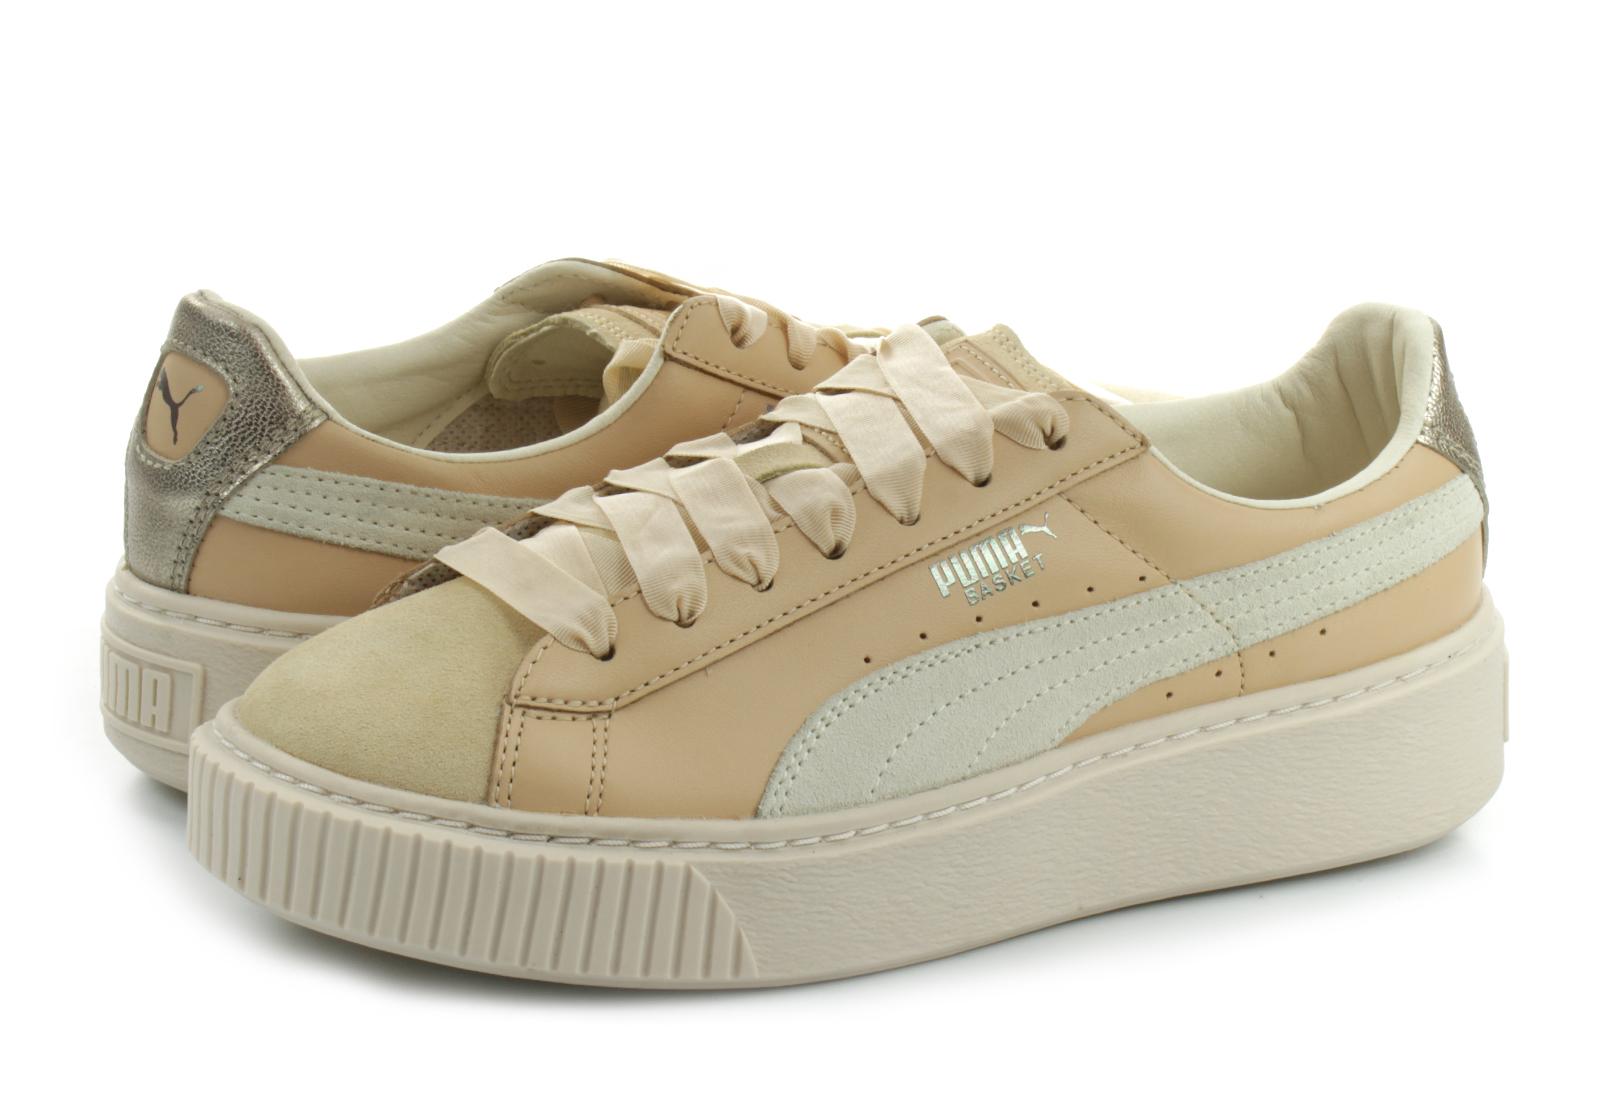 ab40934270ef Puma Shoes - Puma Platform Prem Wns - 36493401-nat - Online shop ...